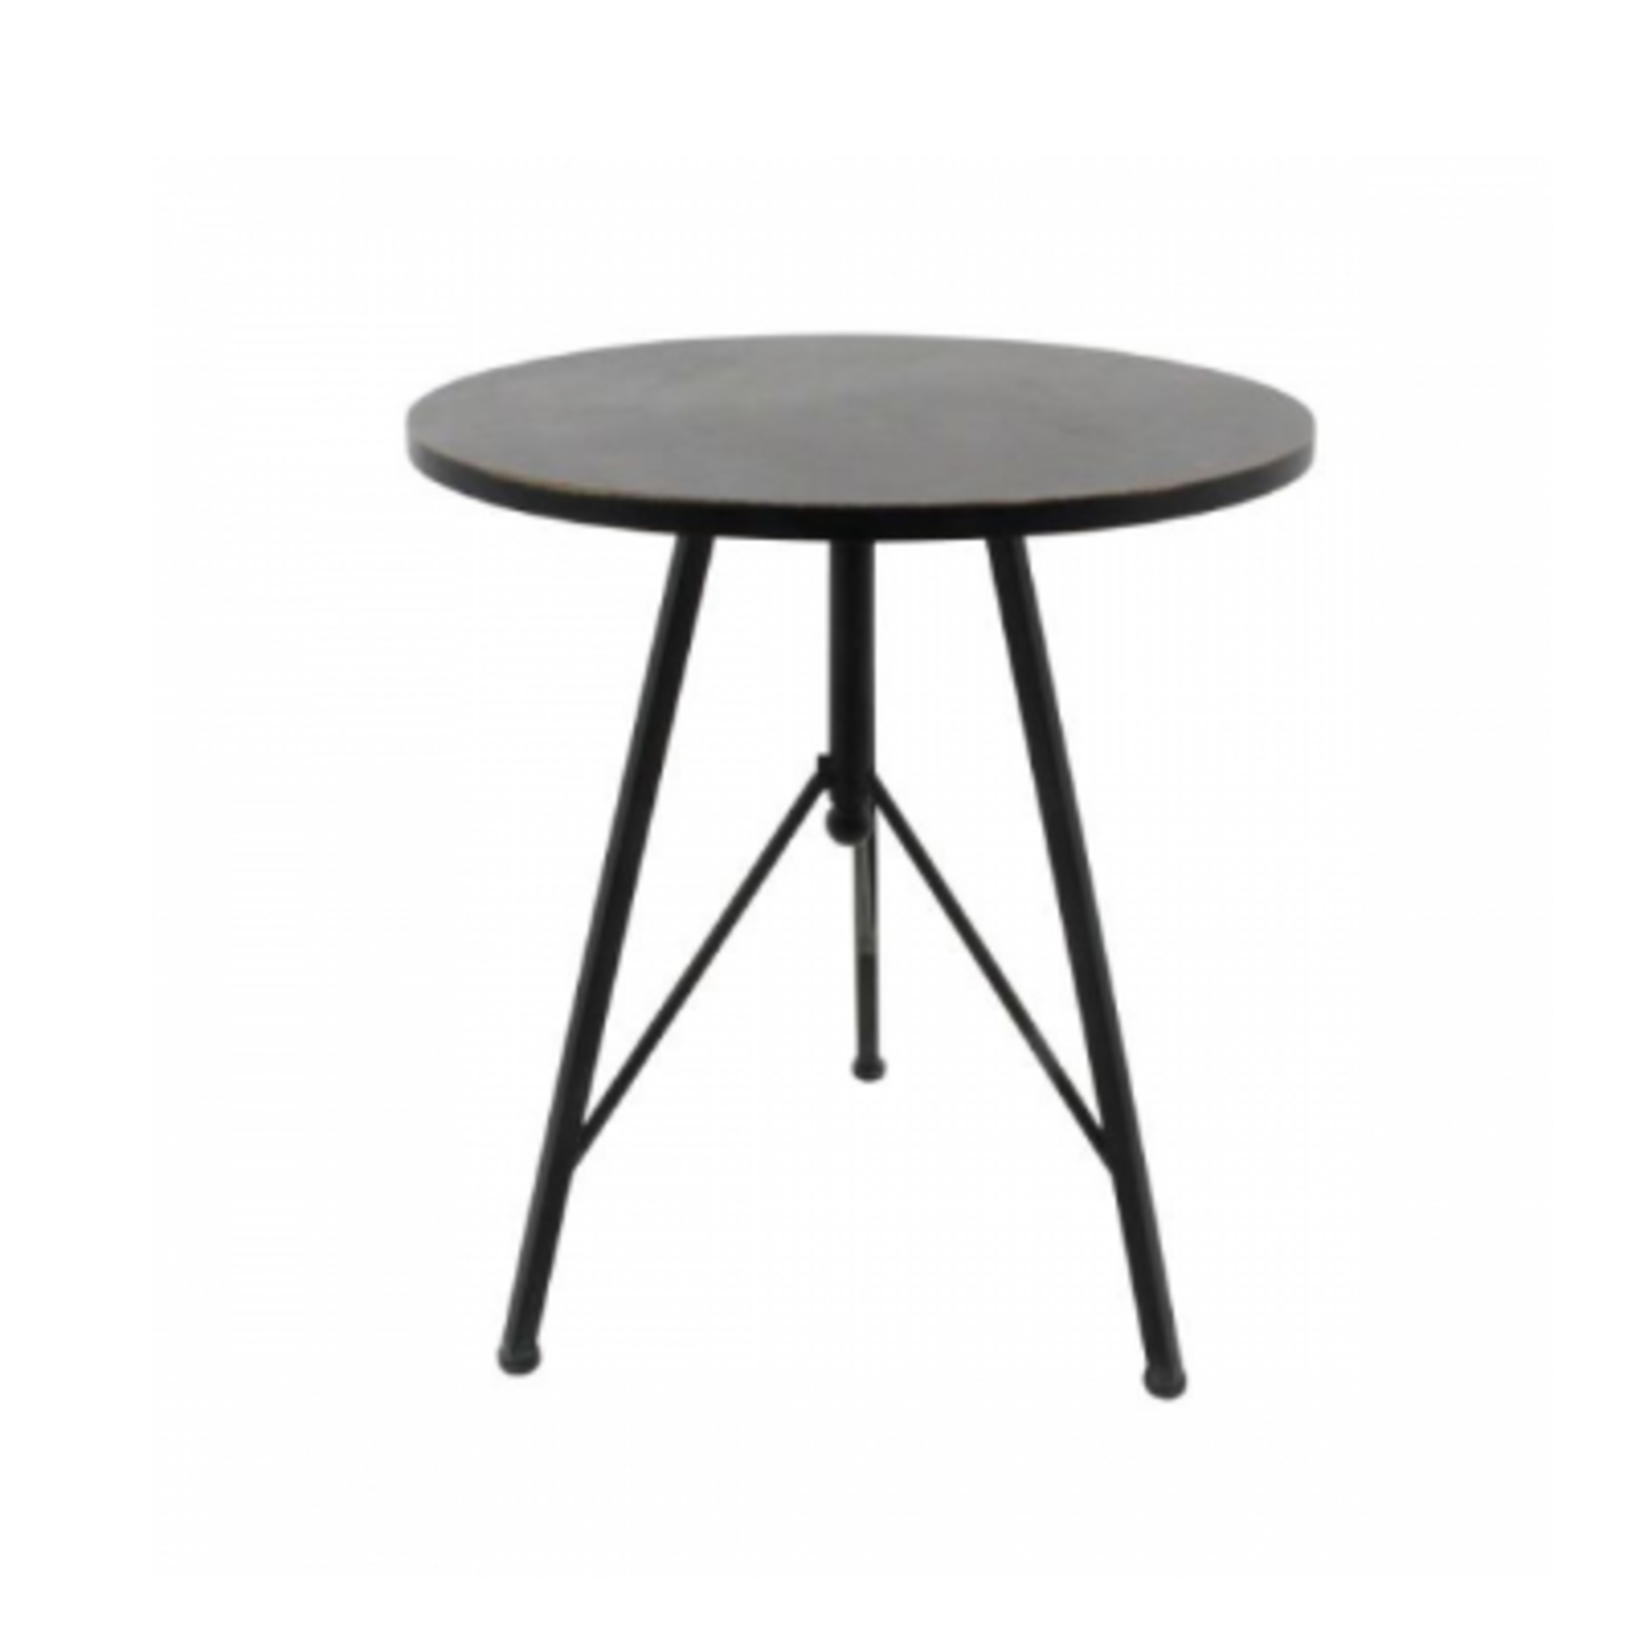 Home society Home Society Table Cody L 59x59x66cm